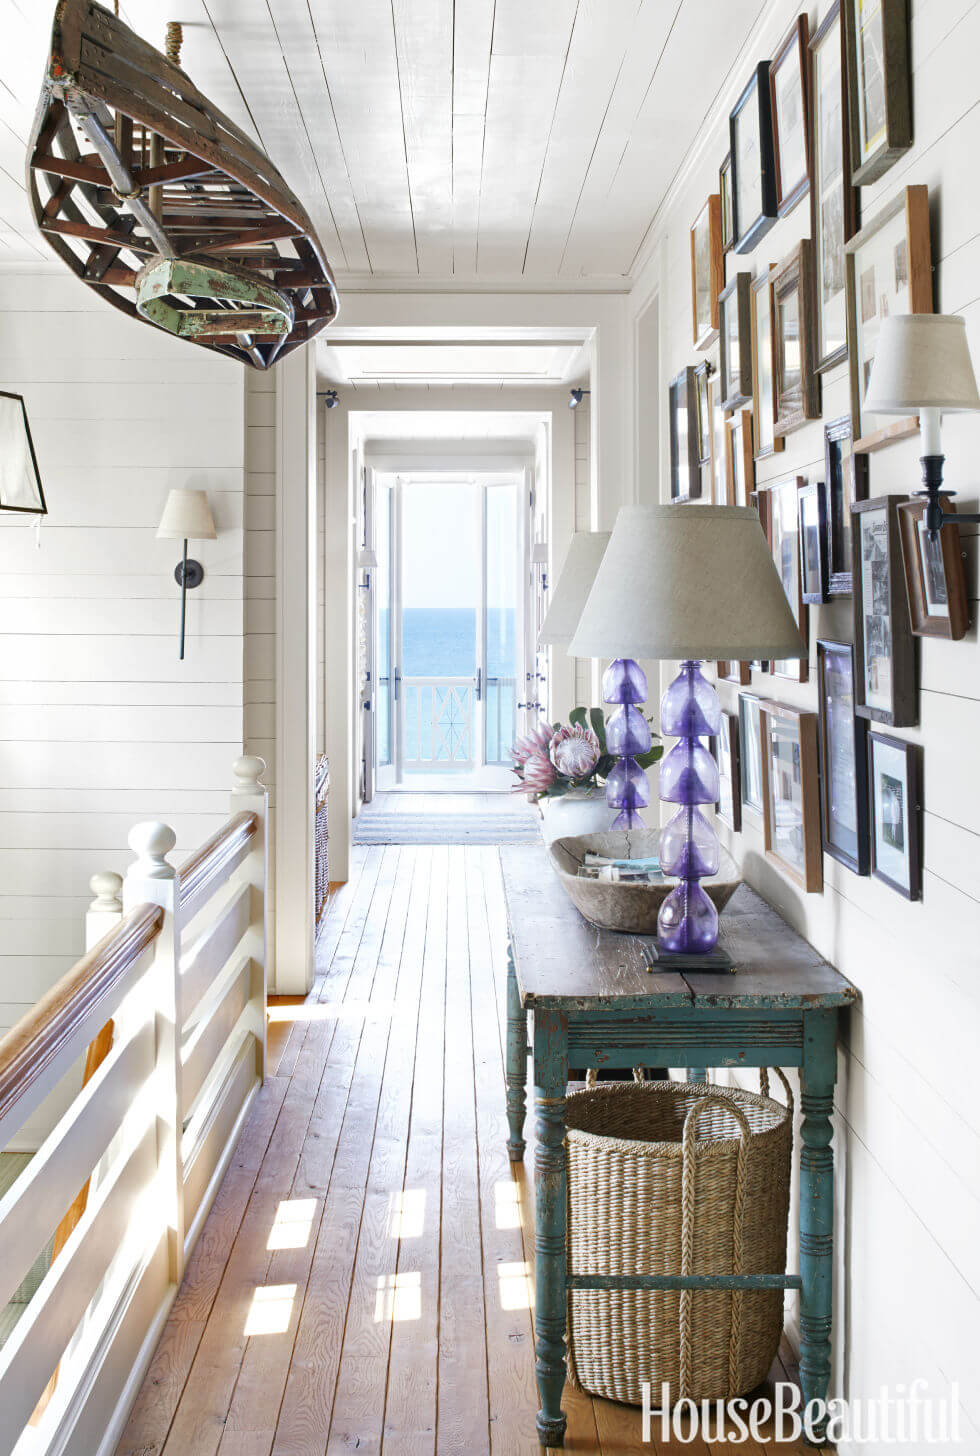 32 Best Beach House Interior Design Ideas and Decorations ... on House Interior Ideas  id=84798